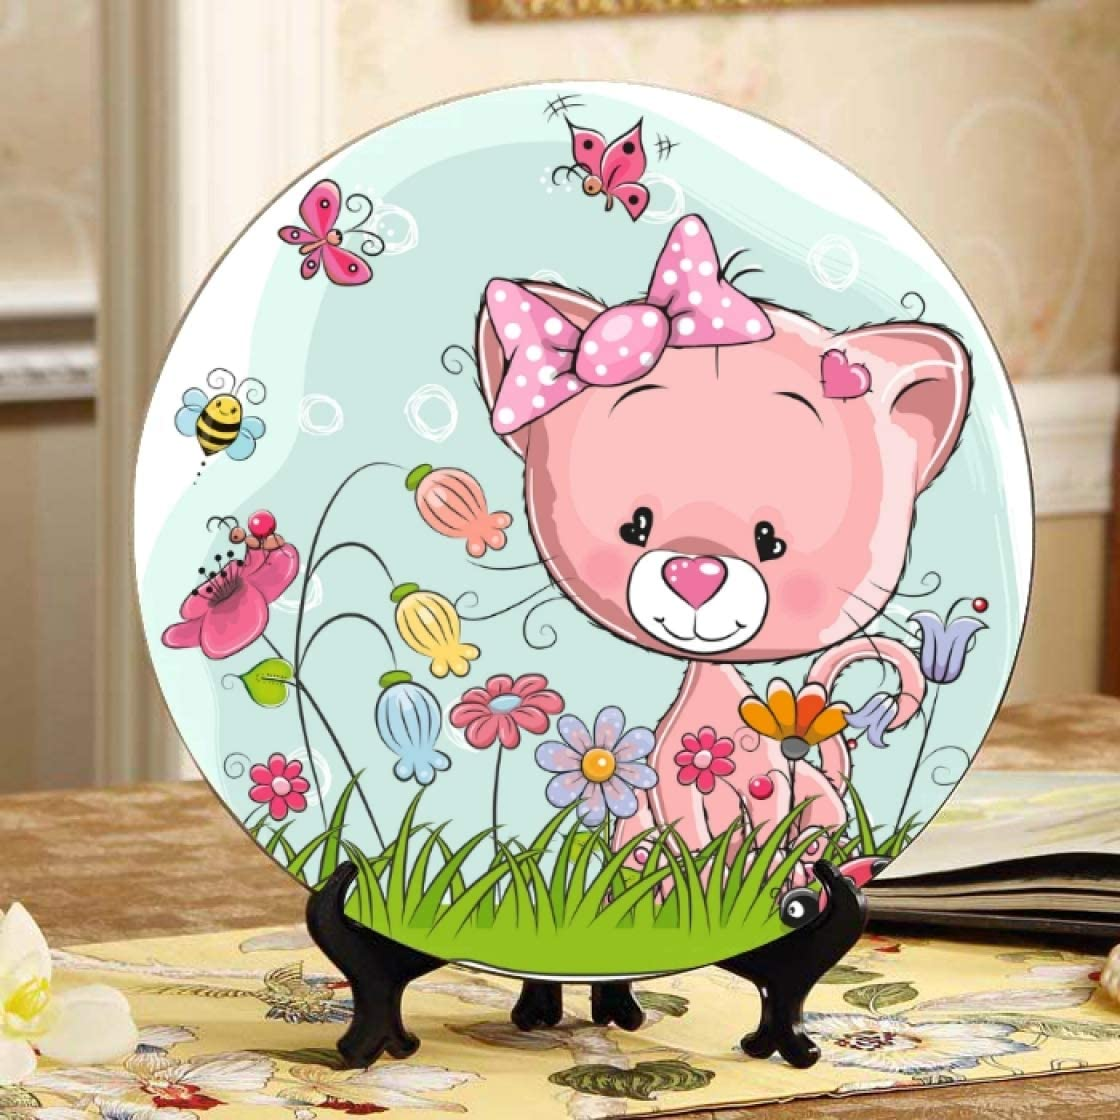 Popular standard Cute Cartoon Animal On A Free shipping Meadow Decorat Ceramic Childrens Plates